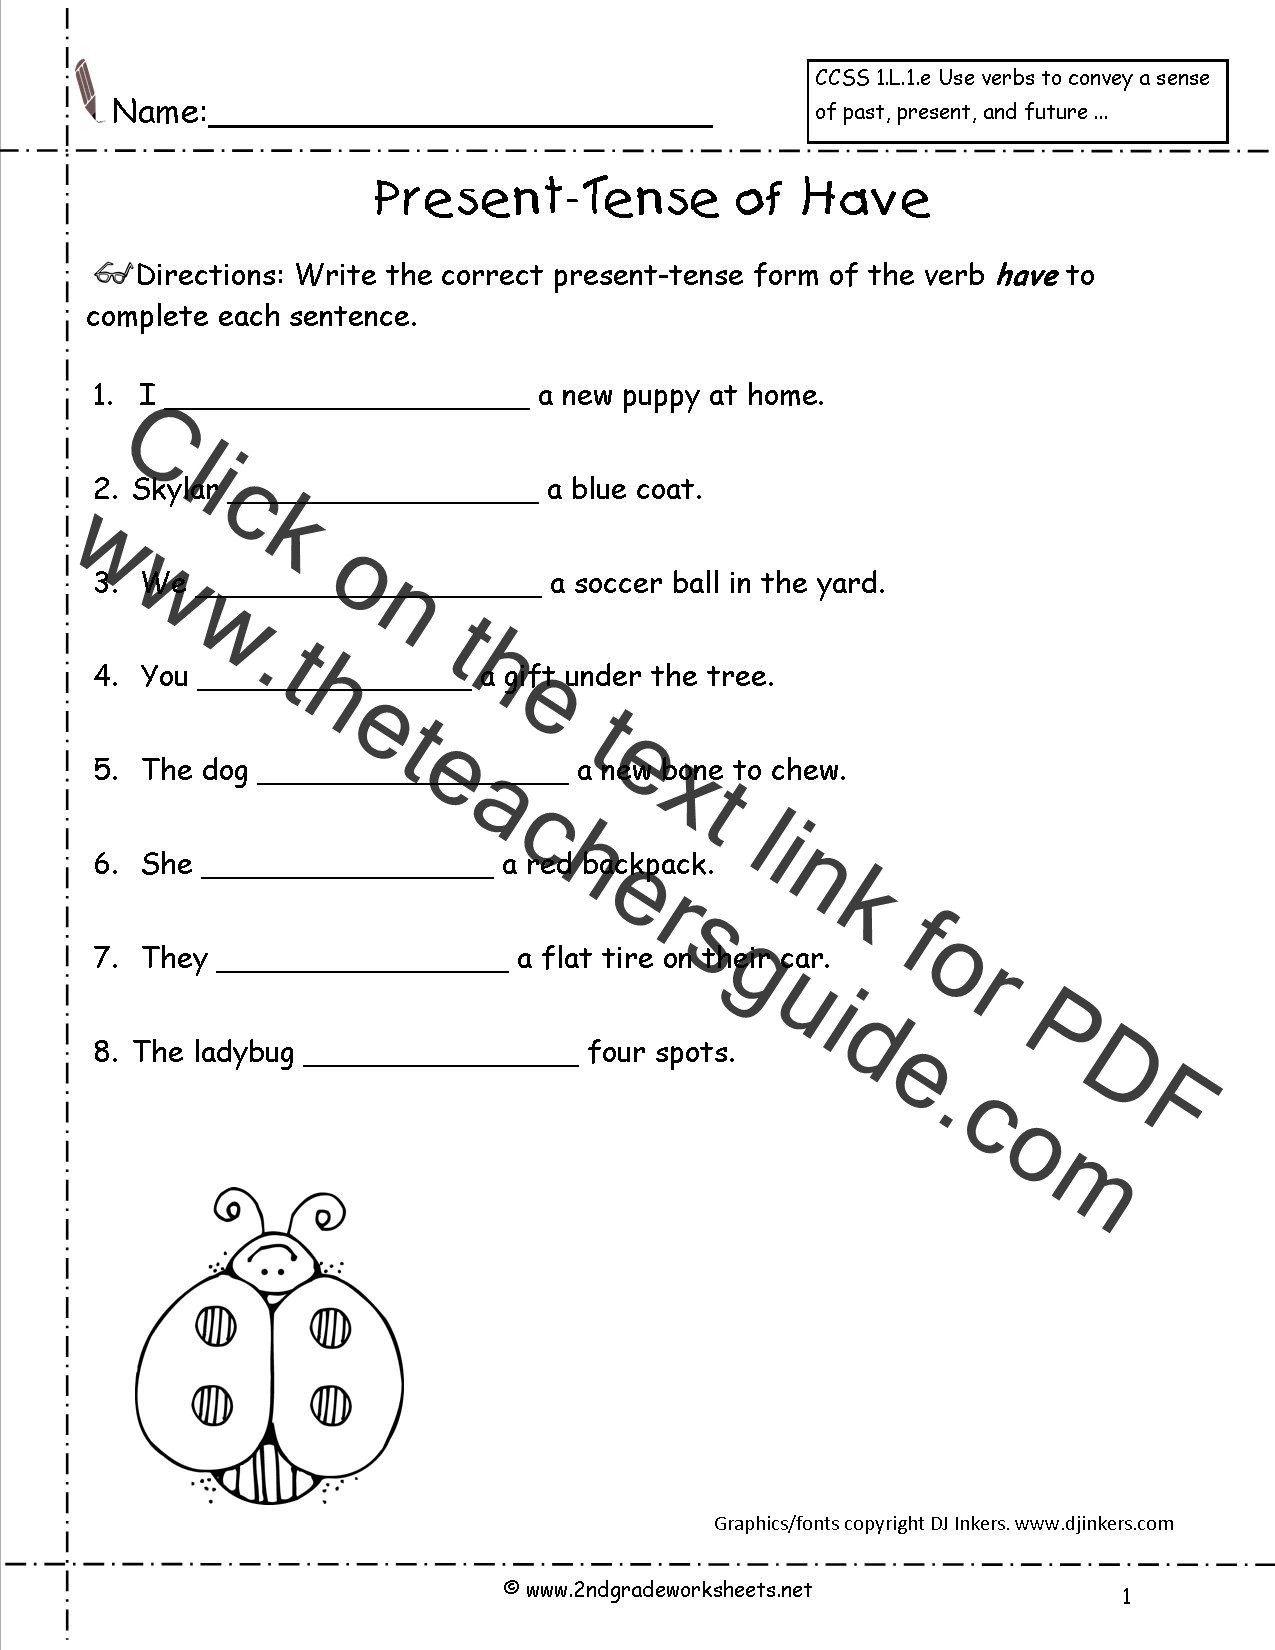 Second Grade Verb Worksheets 4th Grade Verbs Worksheet In 2020 Verb Worksheets Second Grade Verb